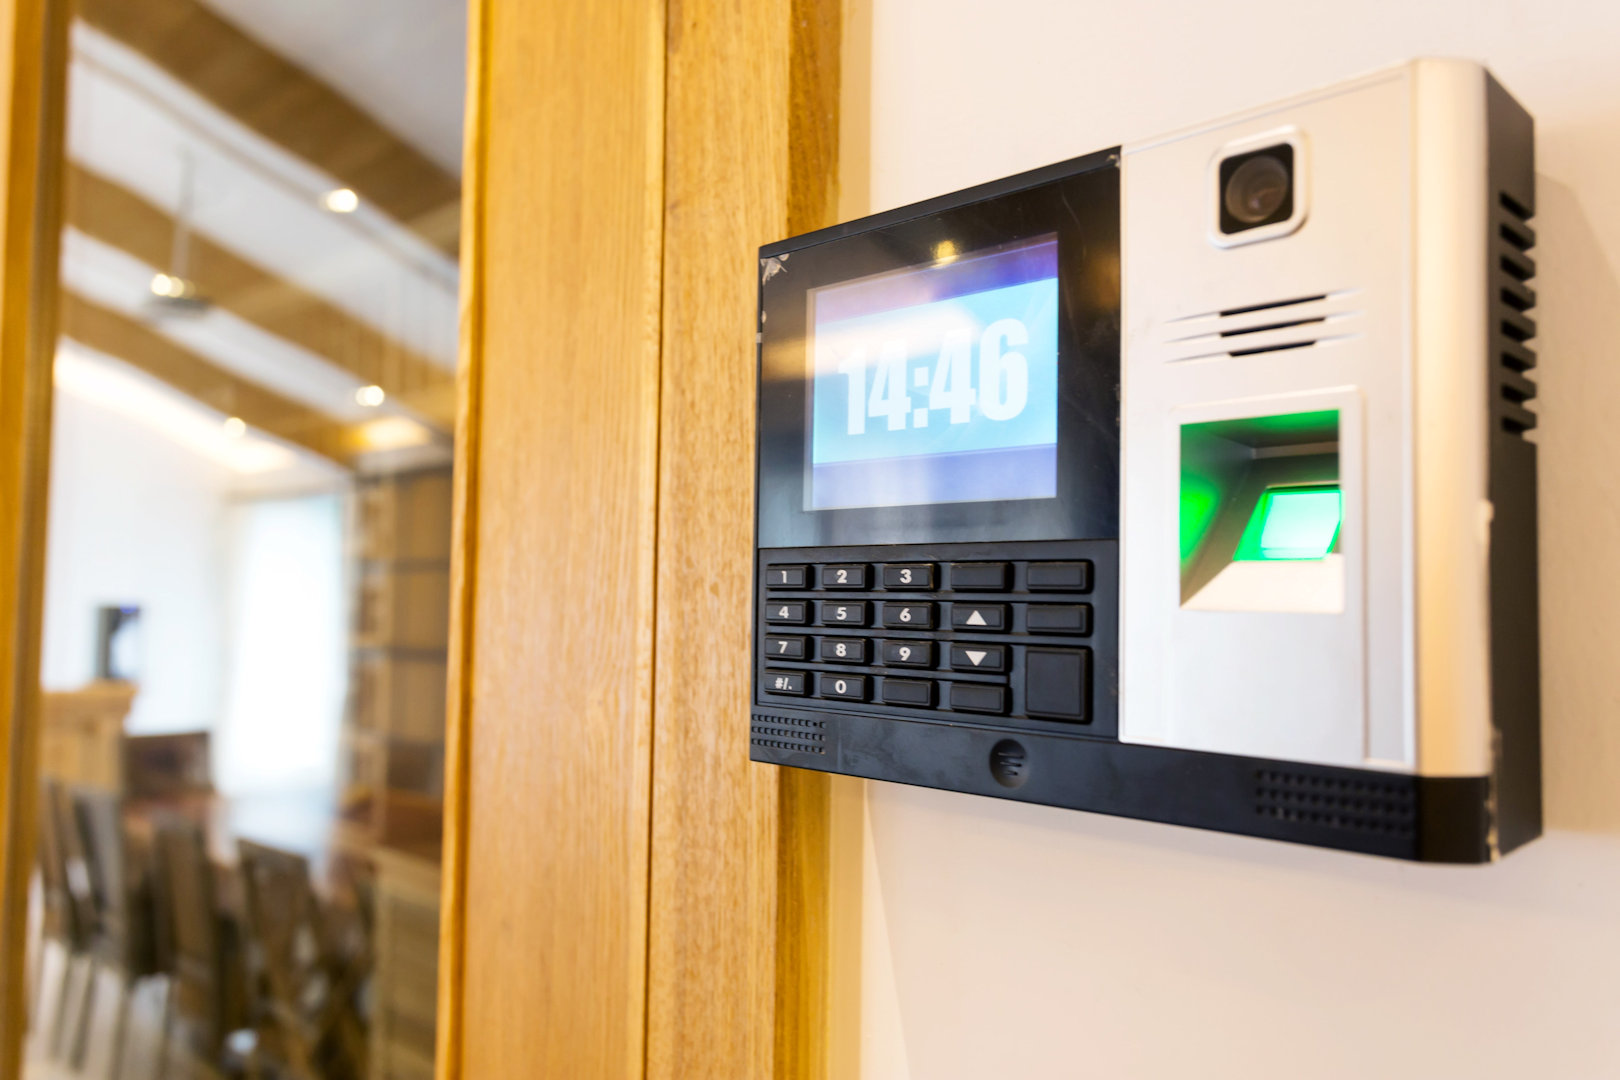 biometric fingerprint reader mounted on office wall